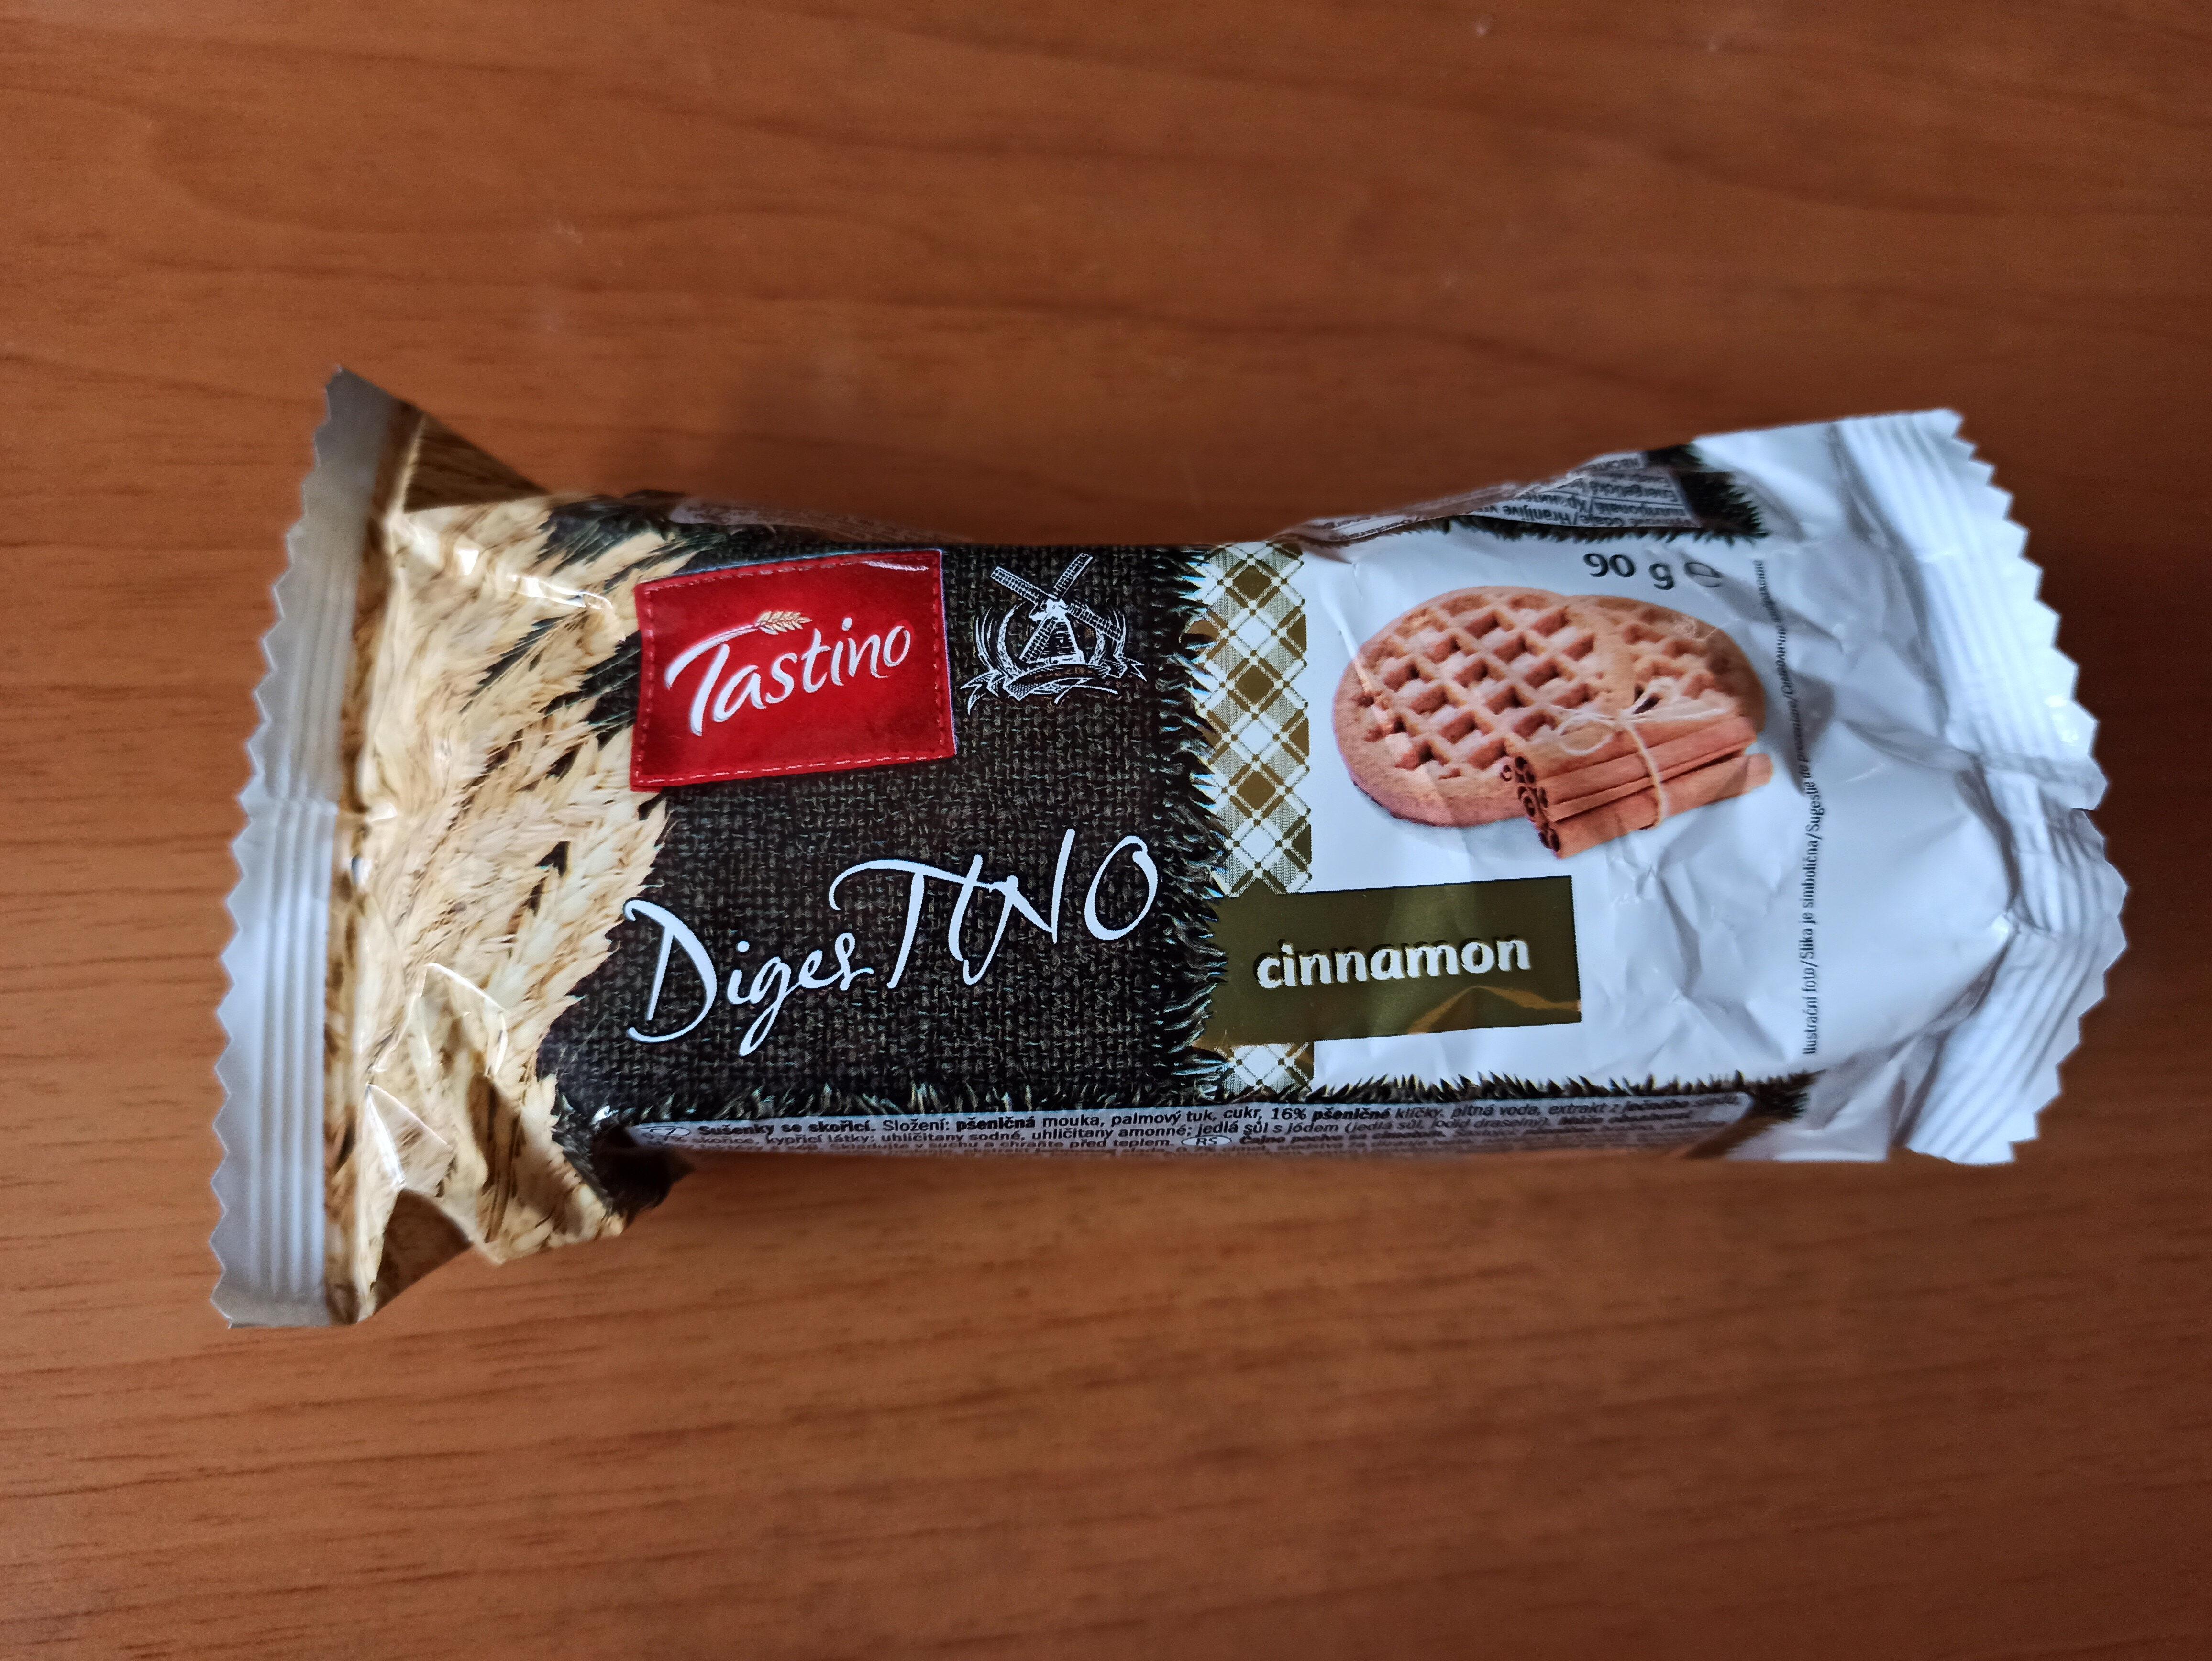 Tastino DigesTINO - Продукт - ro